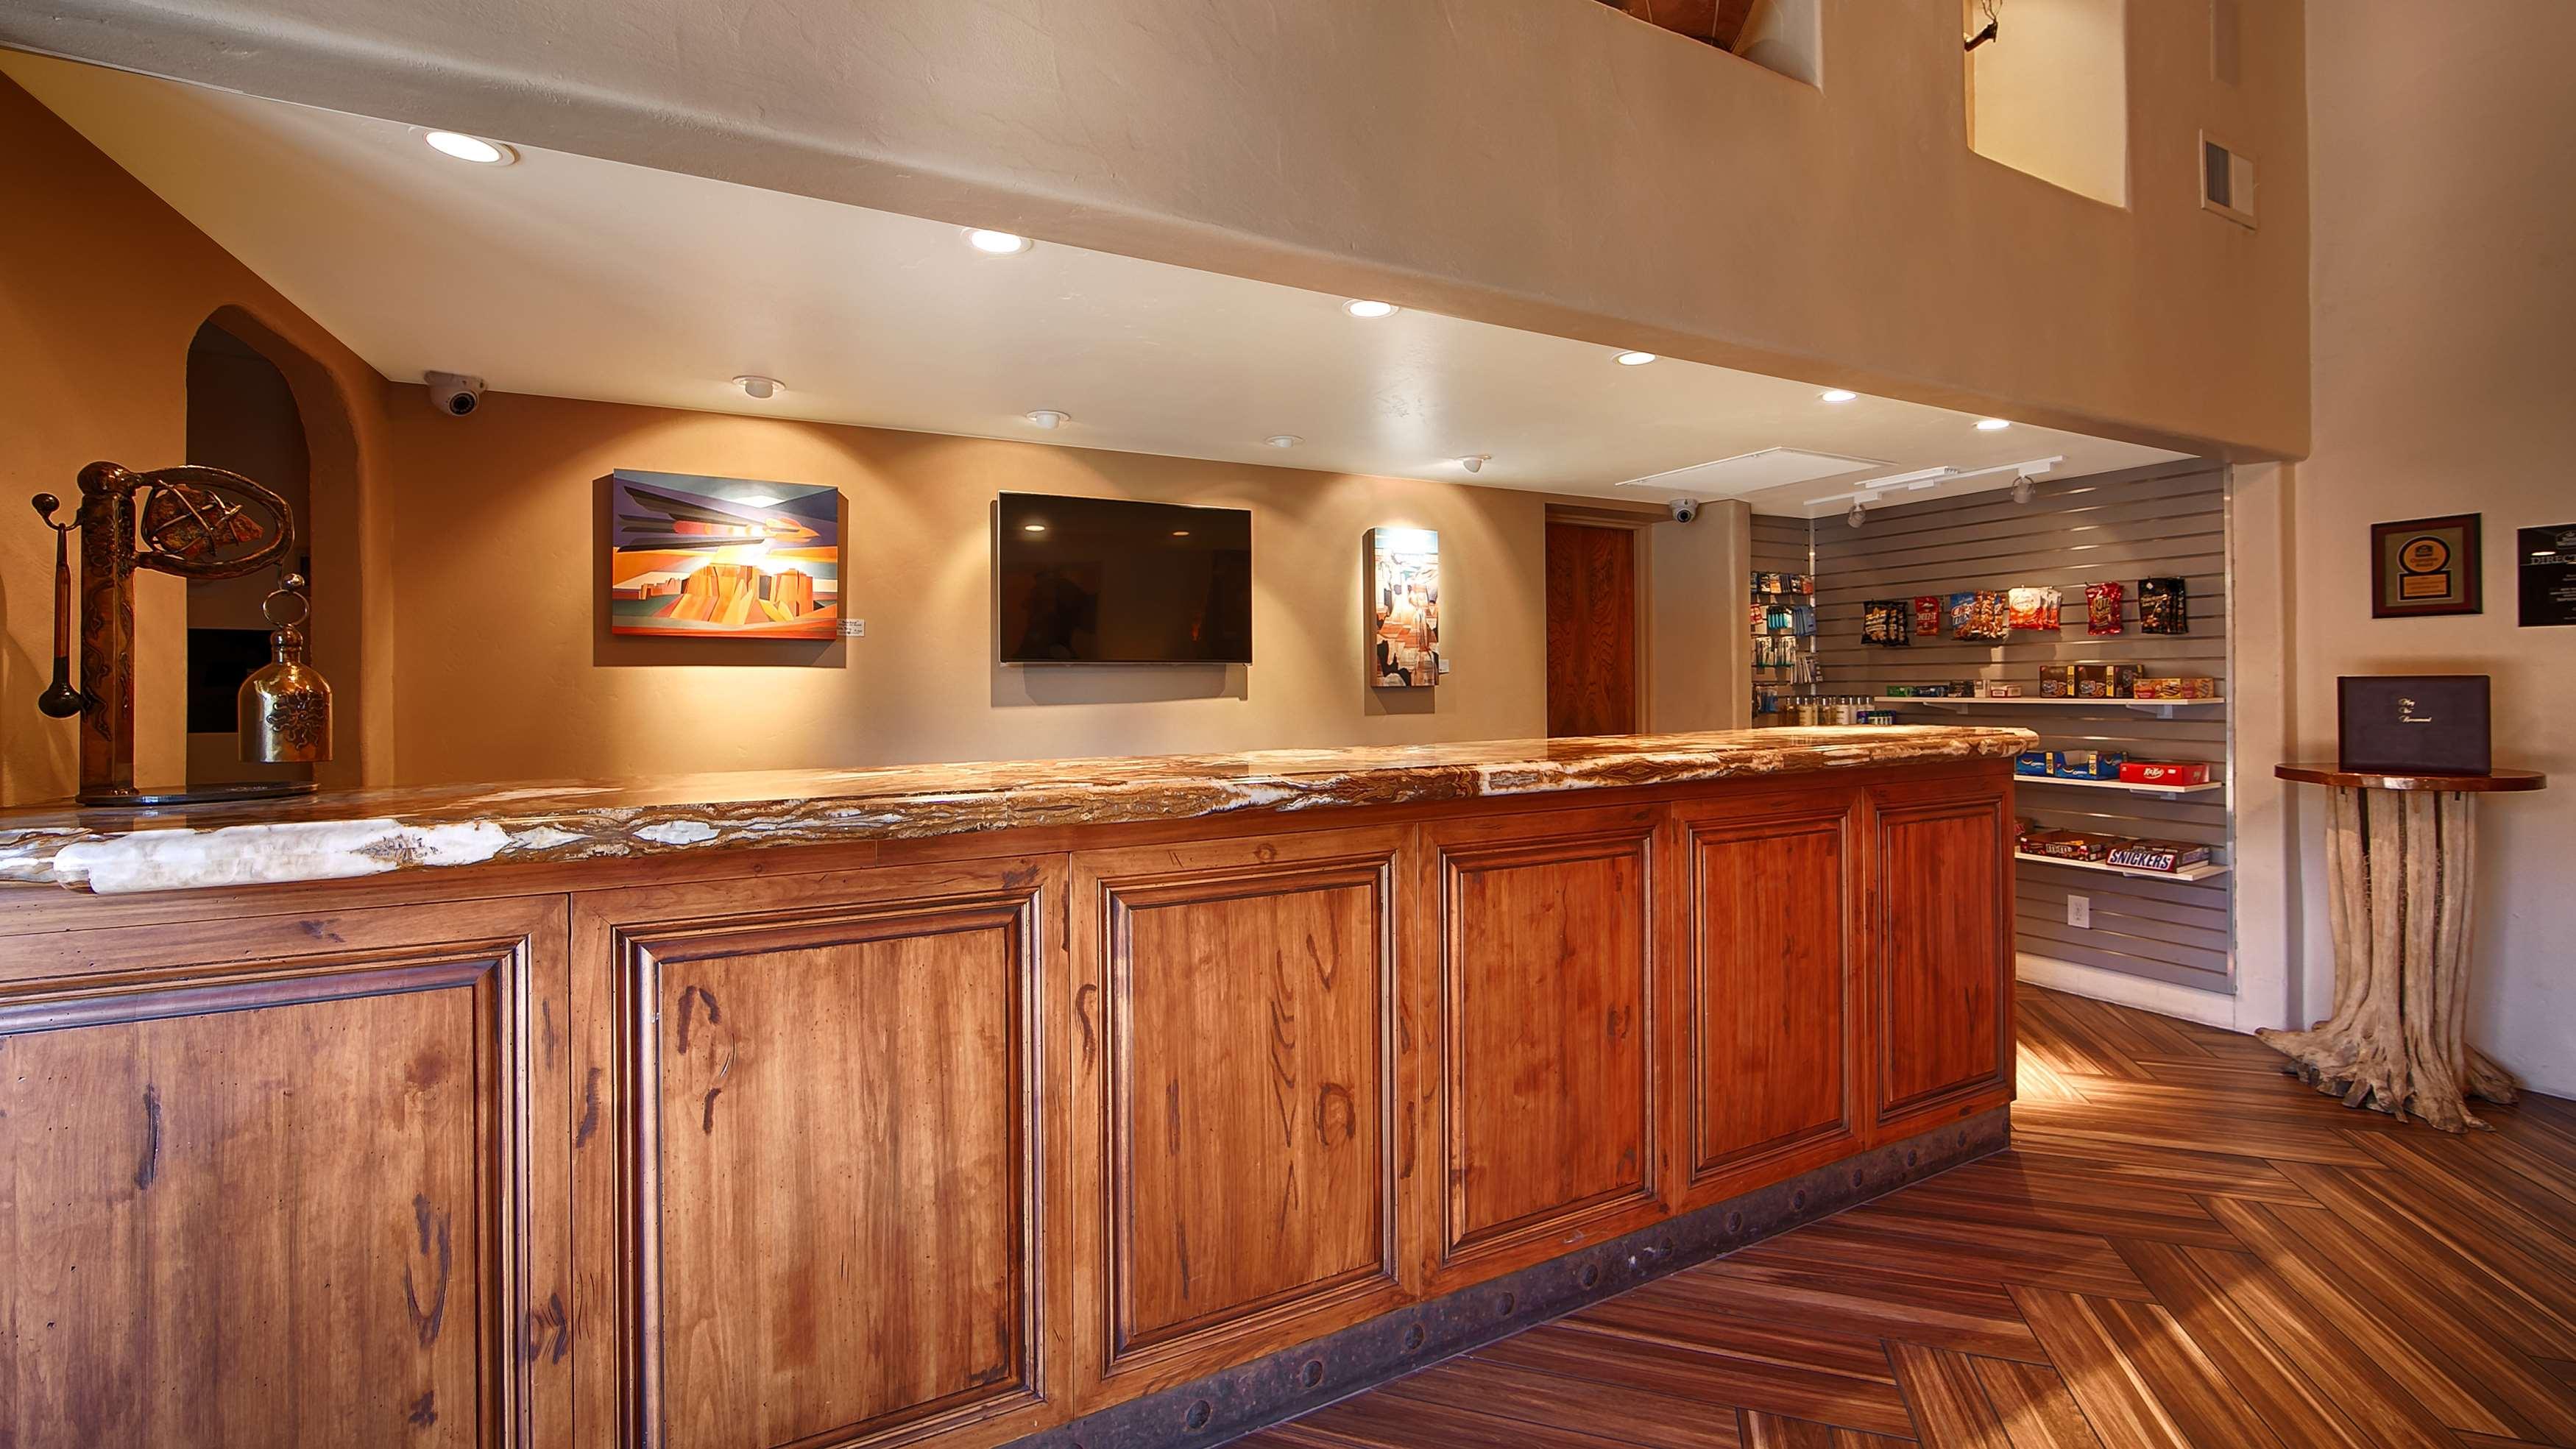 Best Western Plus Arroyo Roble Hotel & Creekside Villas image 7